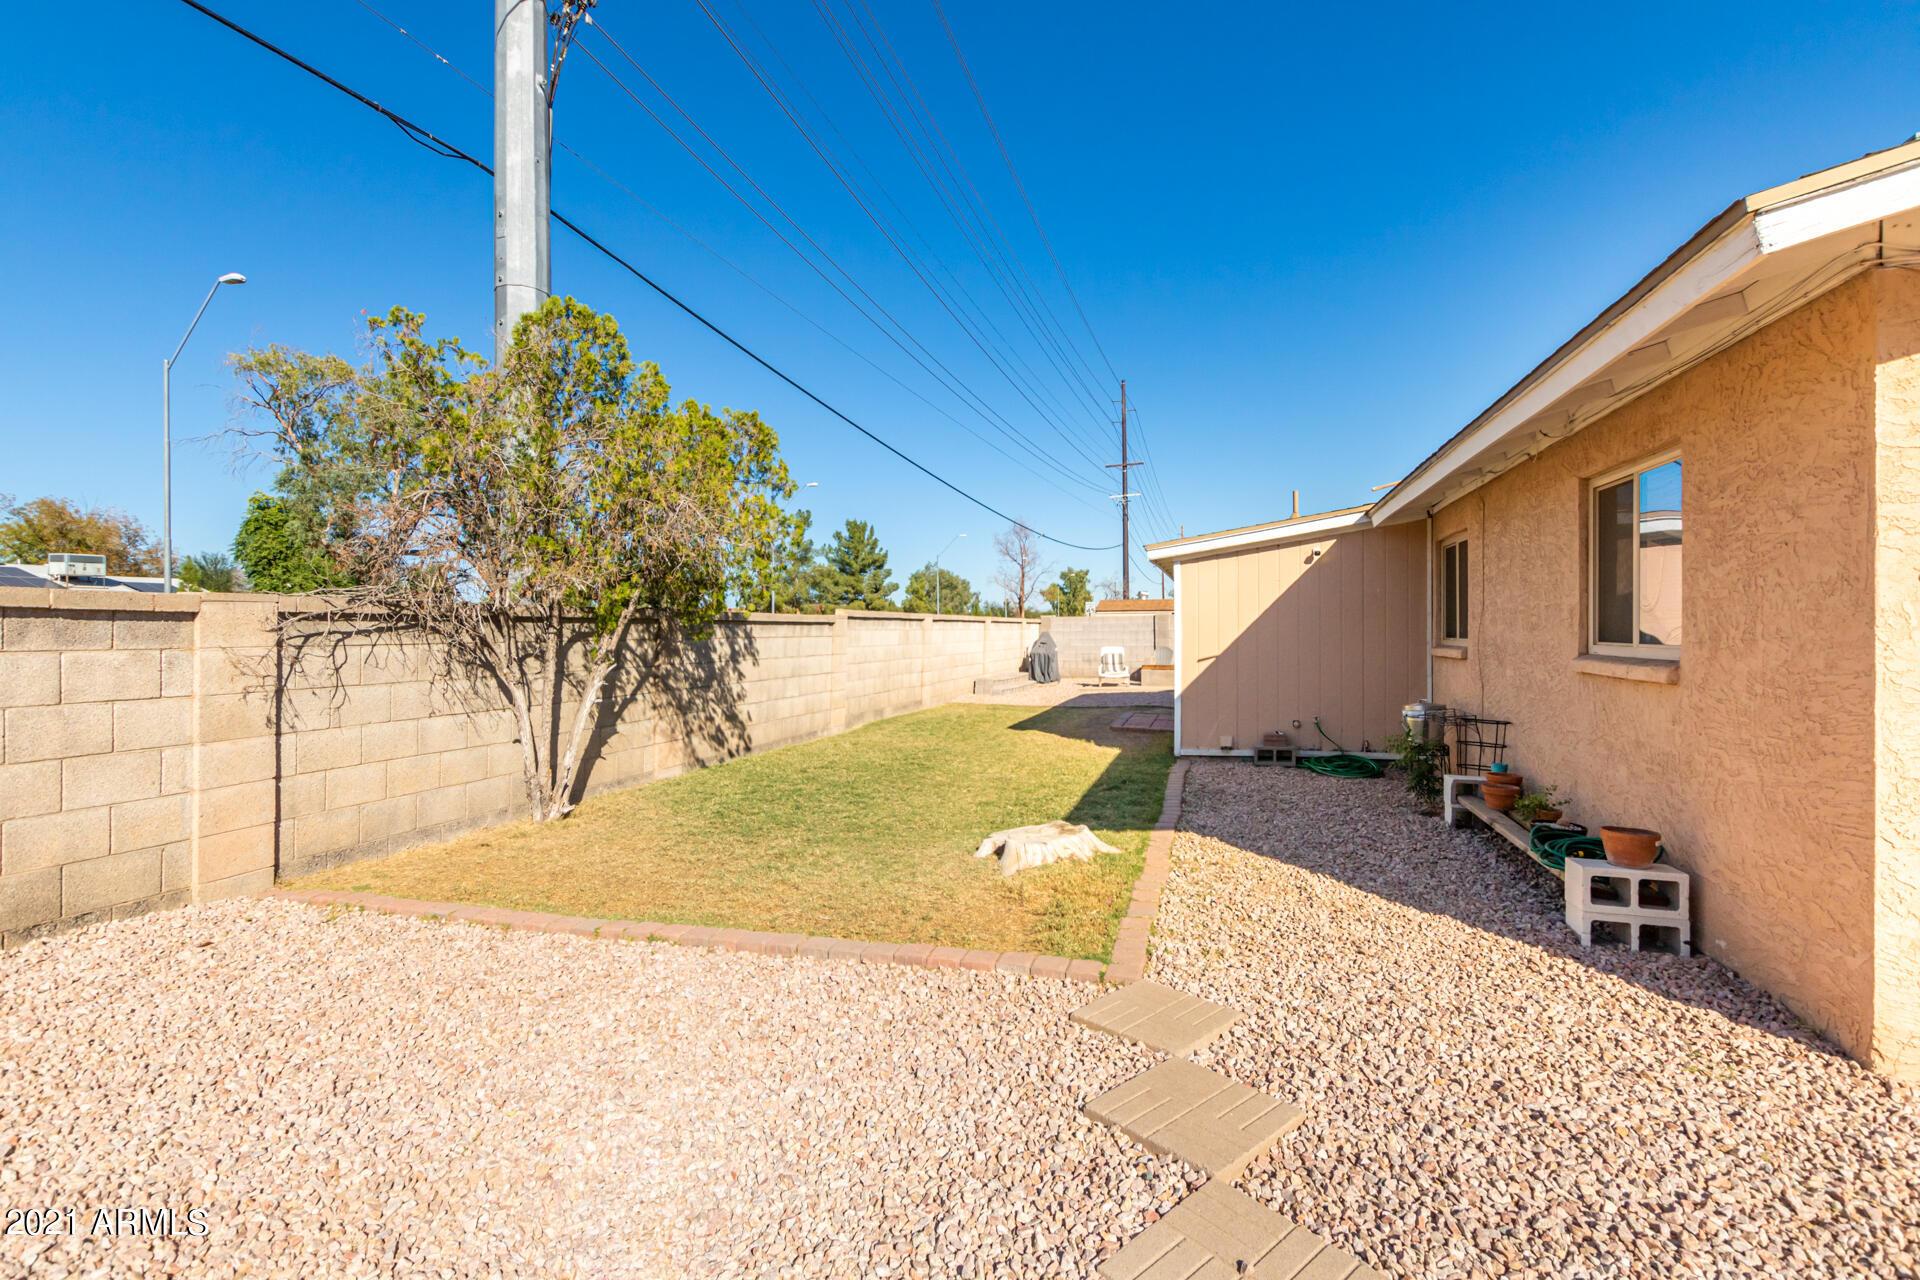 MLS 6307883 330 W ASPEN Avenue, Gilbert, AZ 85233 No HOA Homes